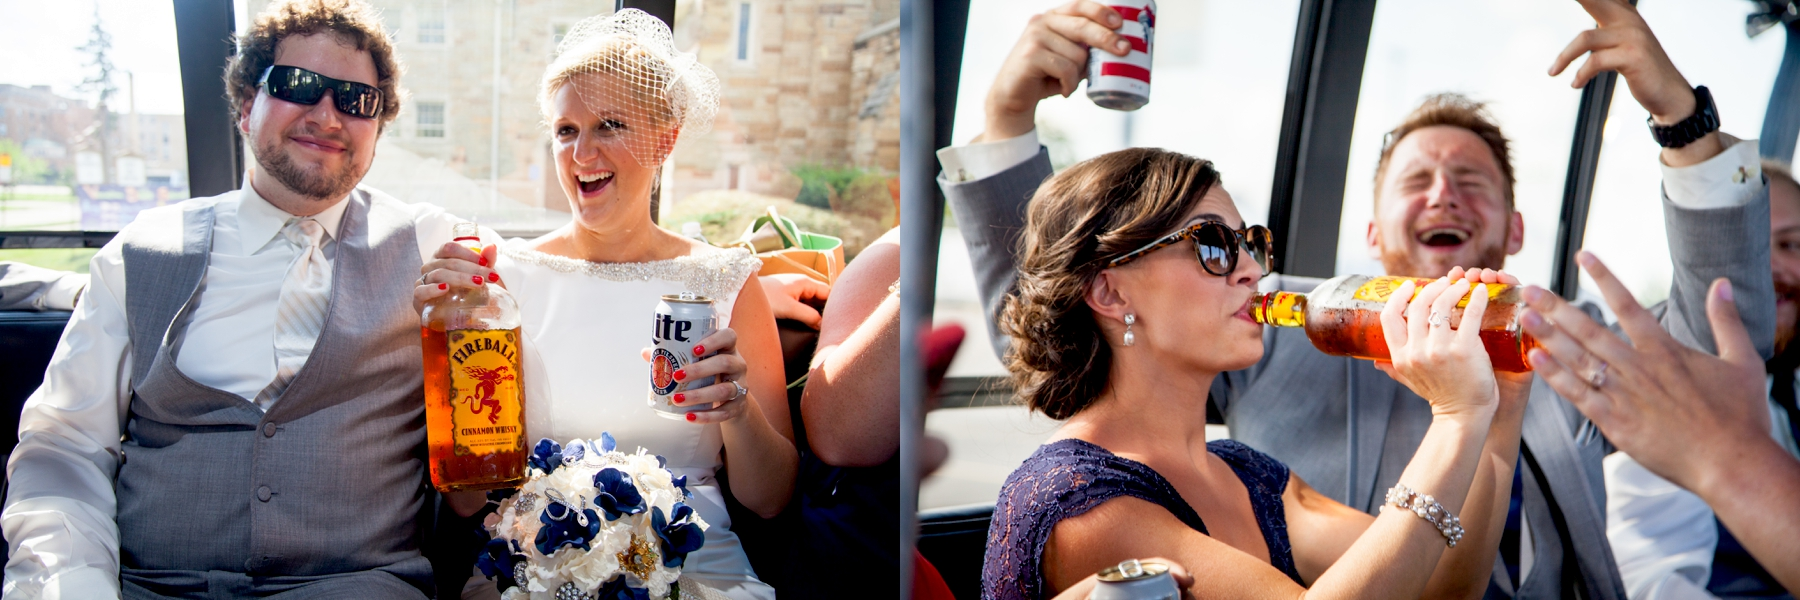 Brandon_Shafer_Photography_Chris_Lauren_Michigan_State_Capital_Wedding_0037.jpg